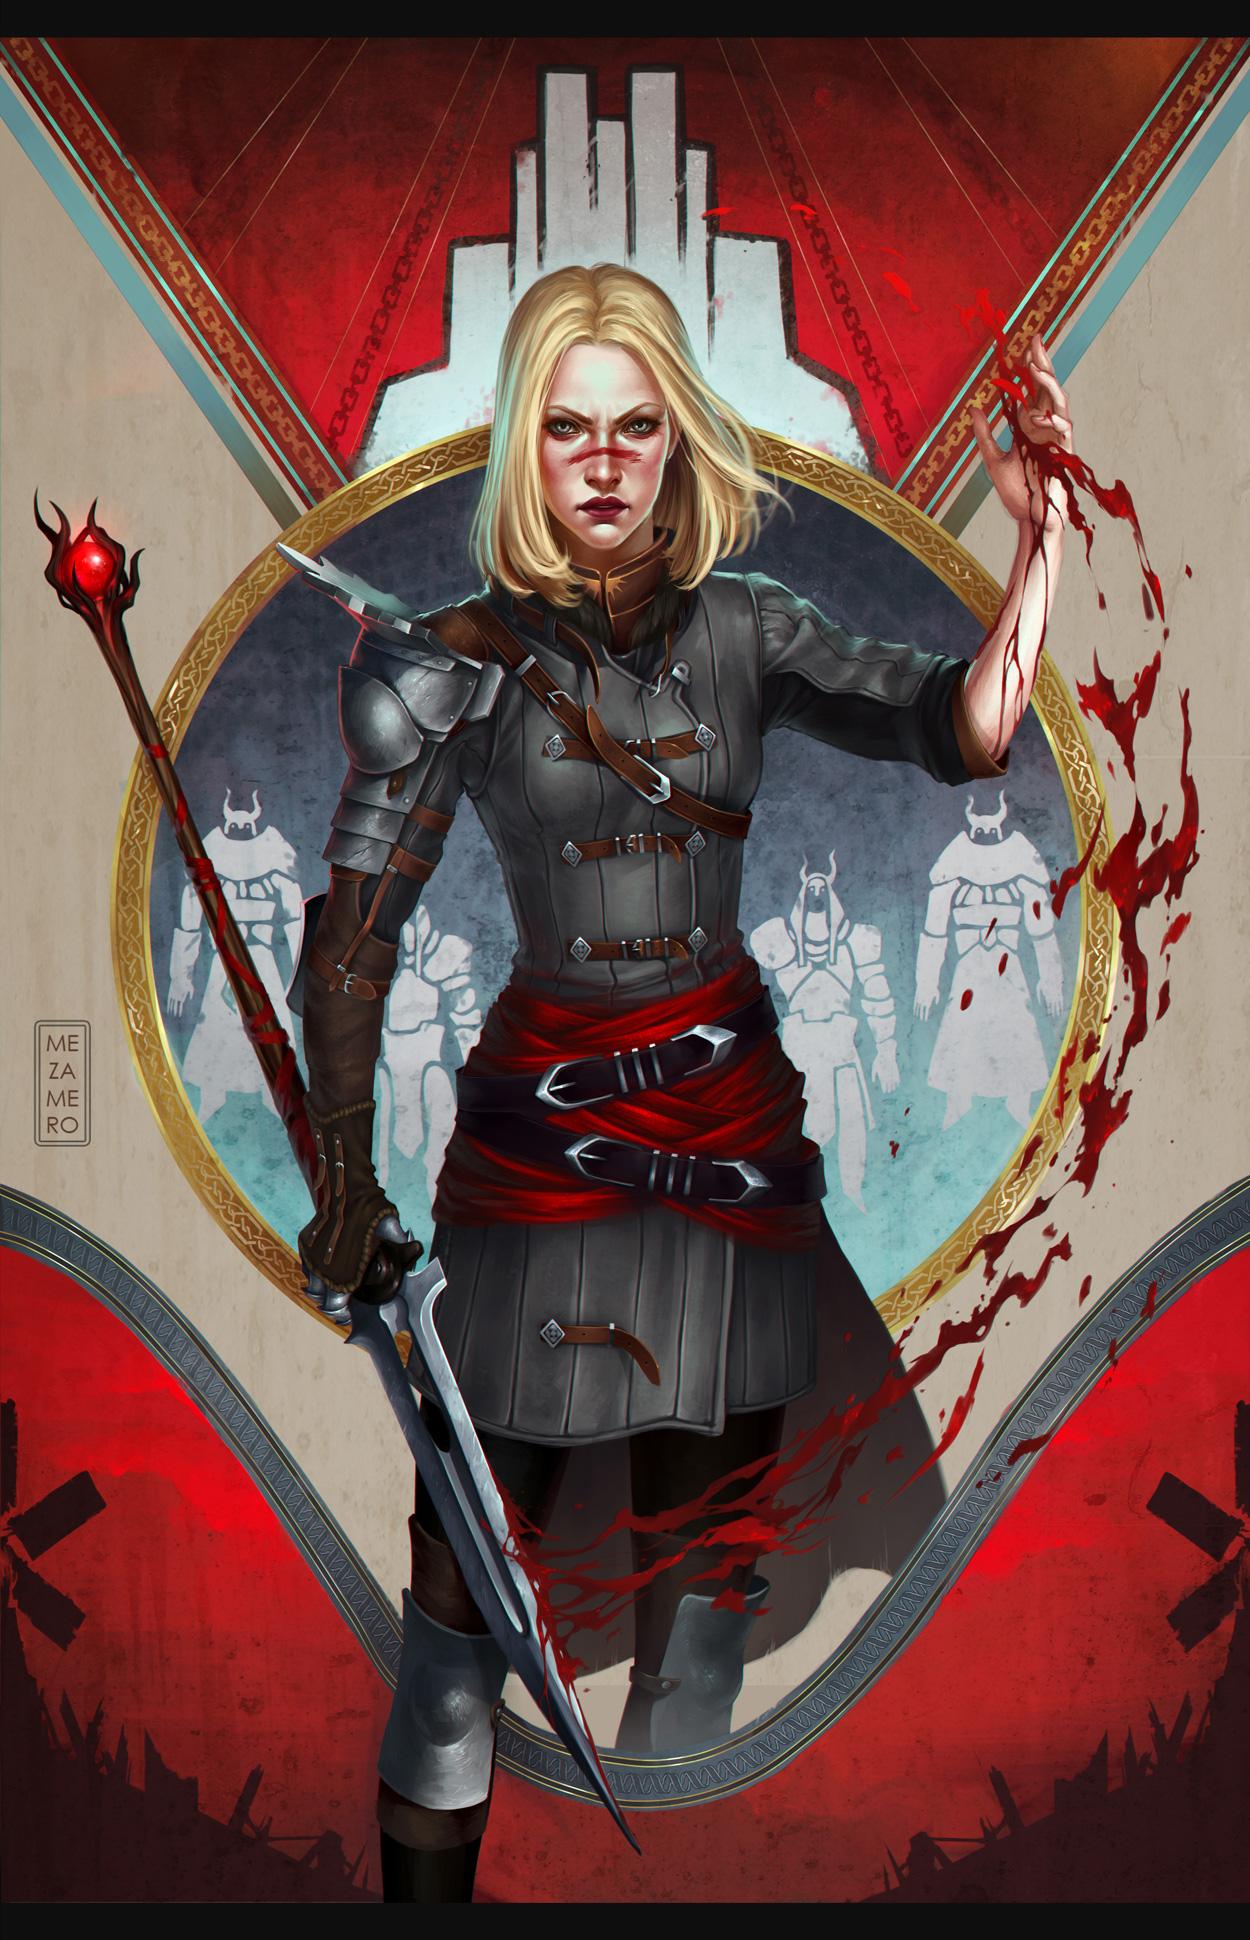 Обои Dragon Age Мечи Воители Кровь Mia Hawke Девушки Фантастика Игры воины Фэнтези